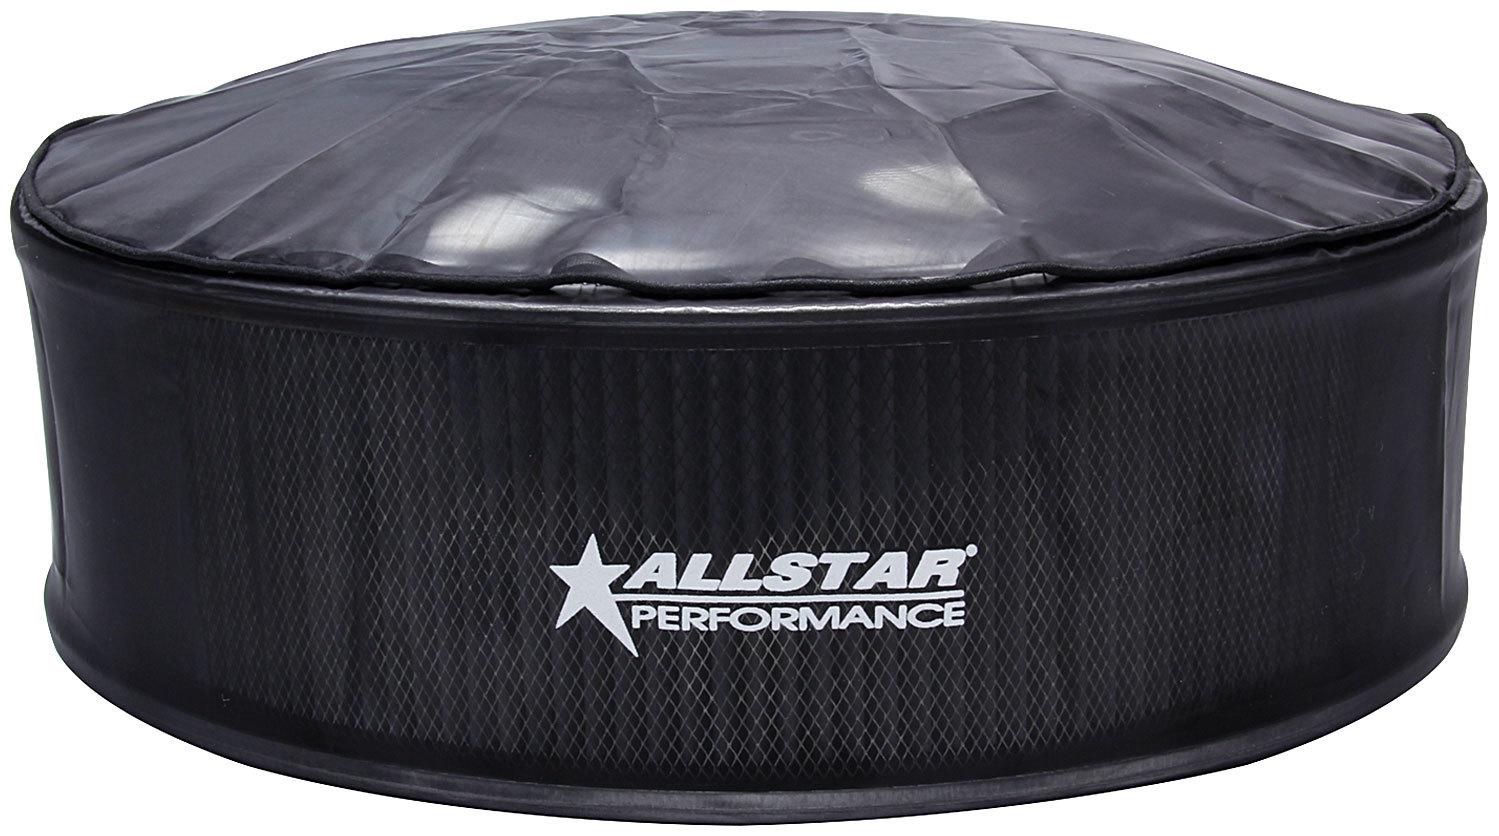 Allstar Performance Air Cleaner Filter 14x4 w/ Top